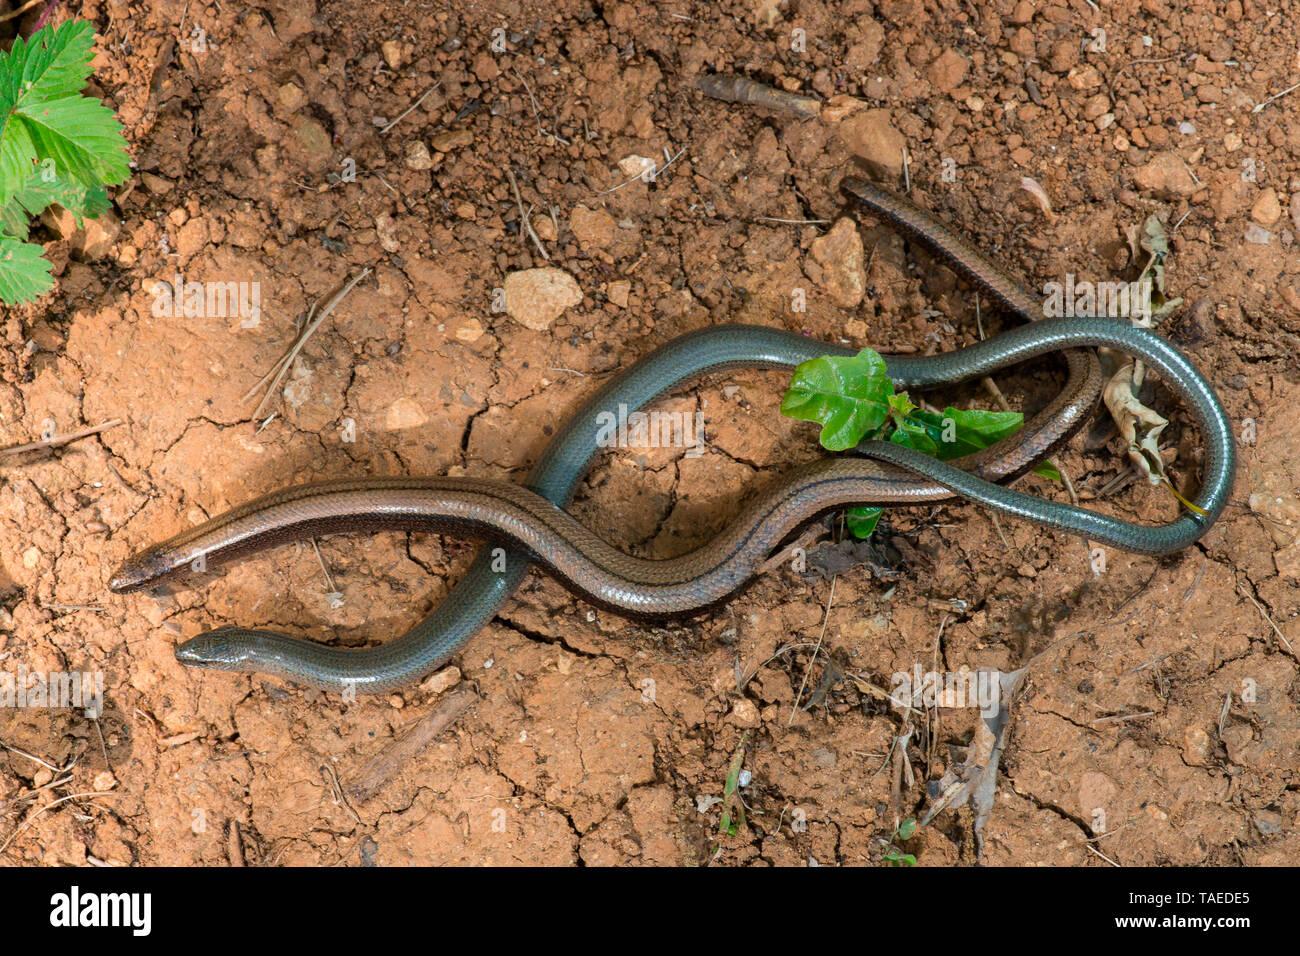 Slow worm (Anguis fragilis) couple in a garden, Bouxieres-aux-dames, Lorraine, France Stock Photo